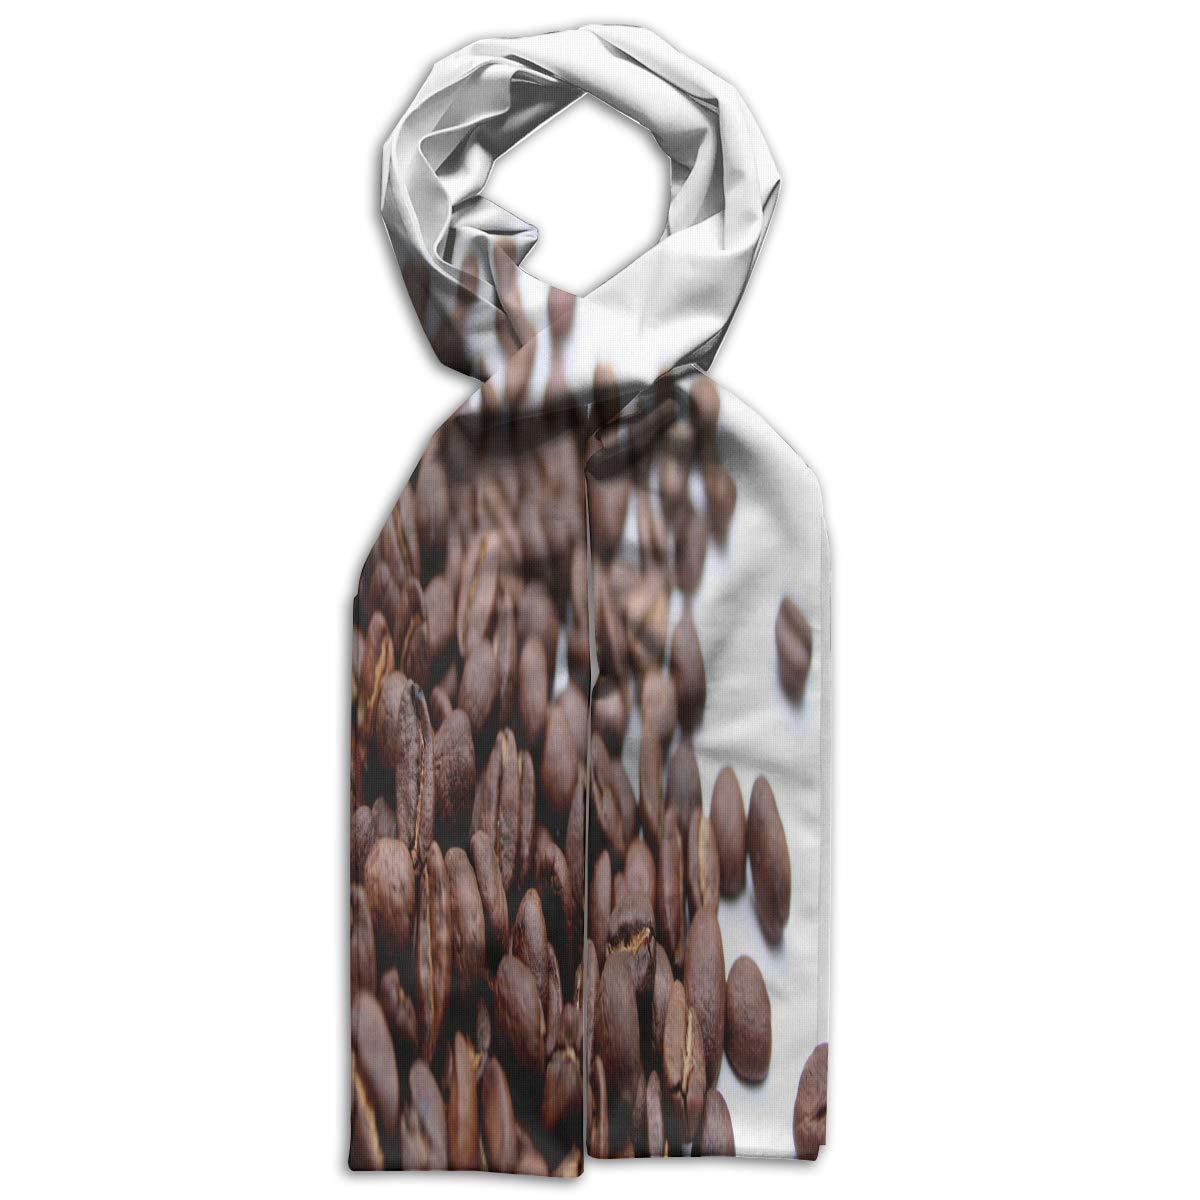 Kids Scarf Coffee Beans Muffler Winter Warm Shawl Wrap For Youth